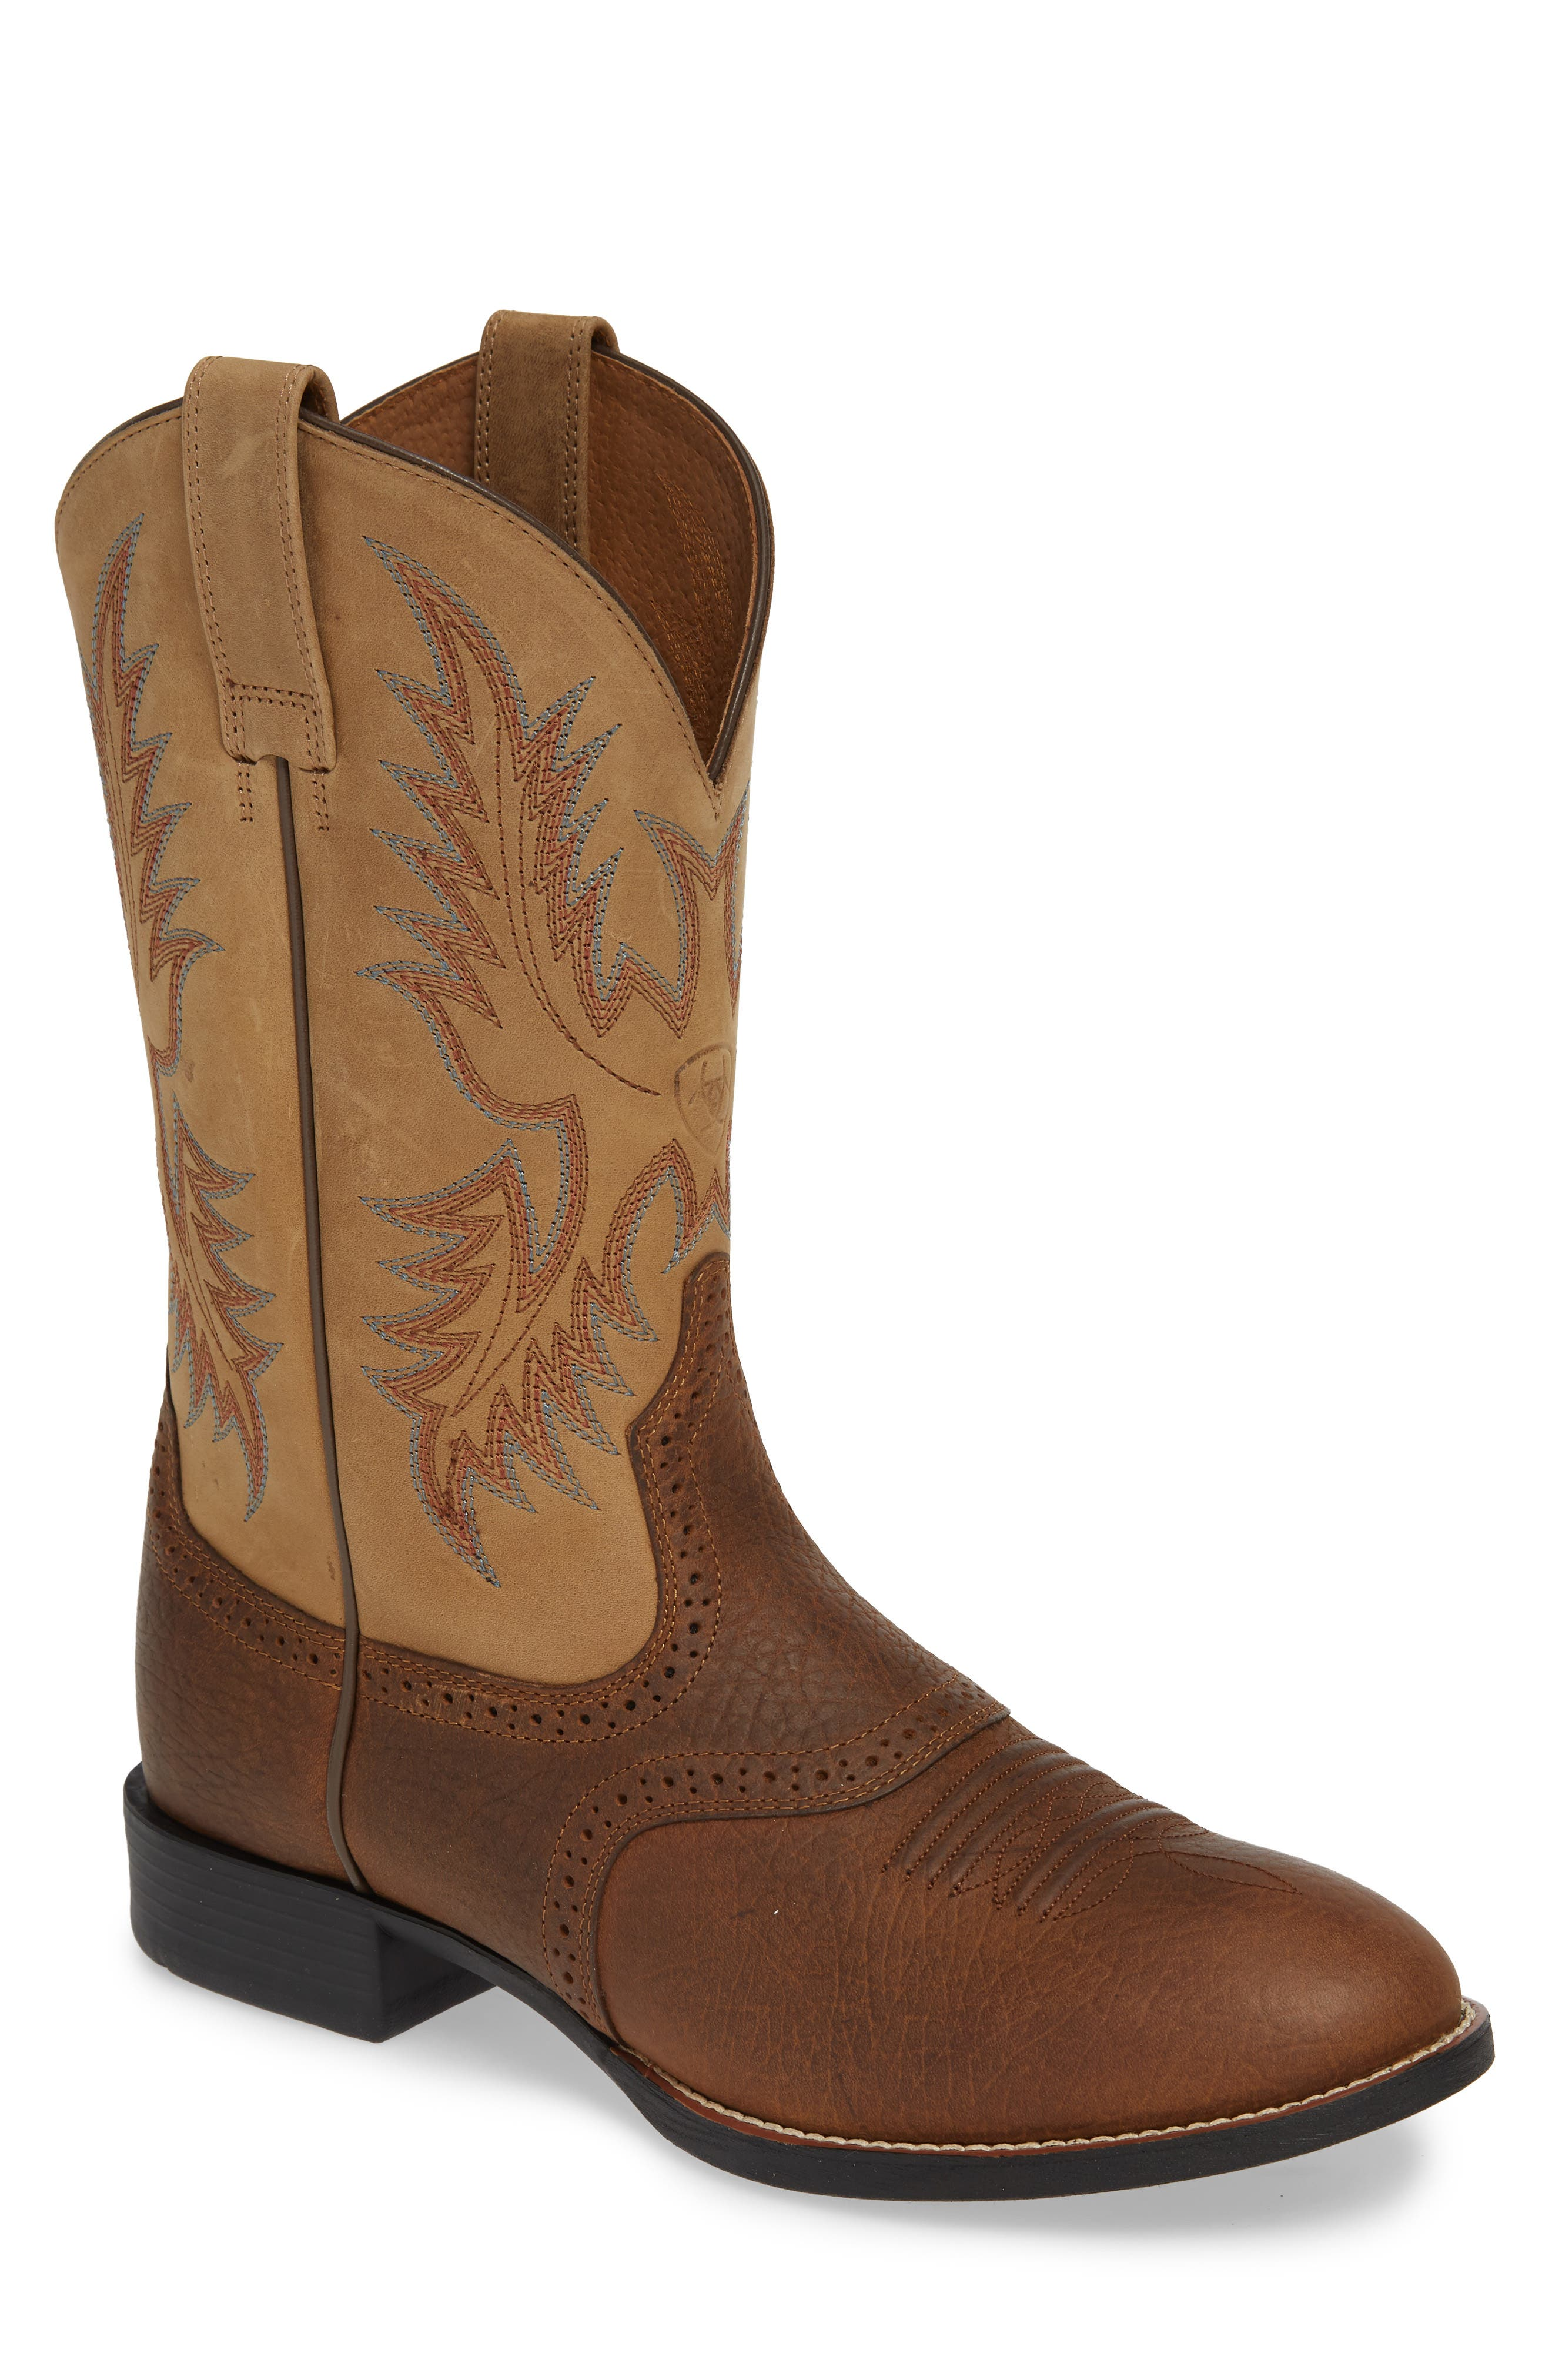 Ariat Heritage Stockman Cowboy Boot- Brown